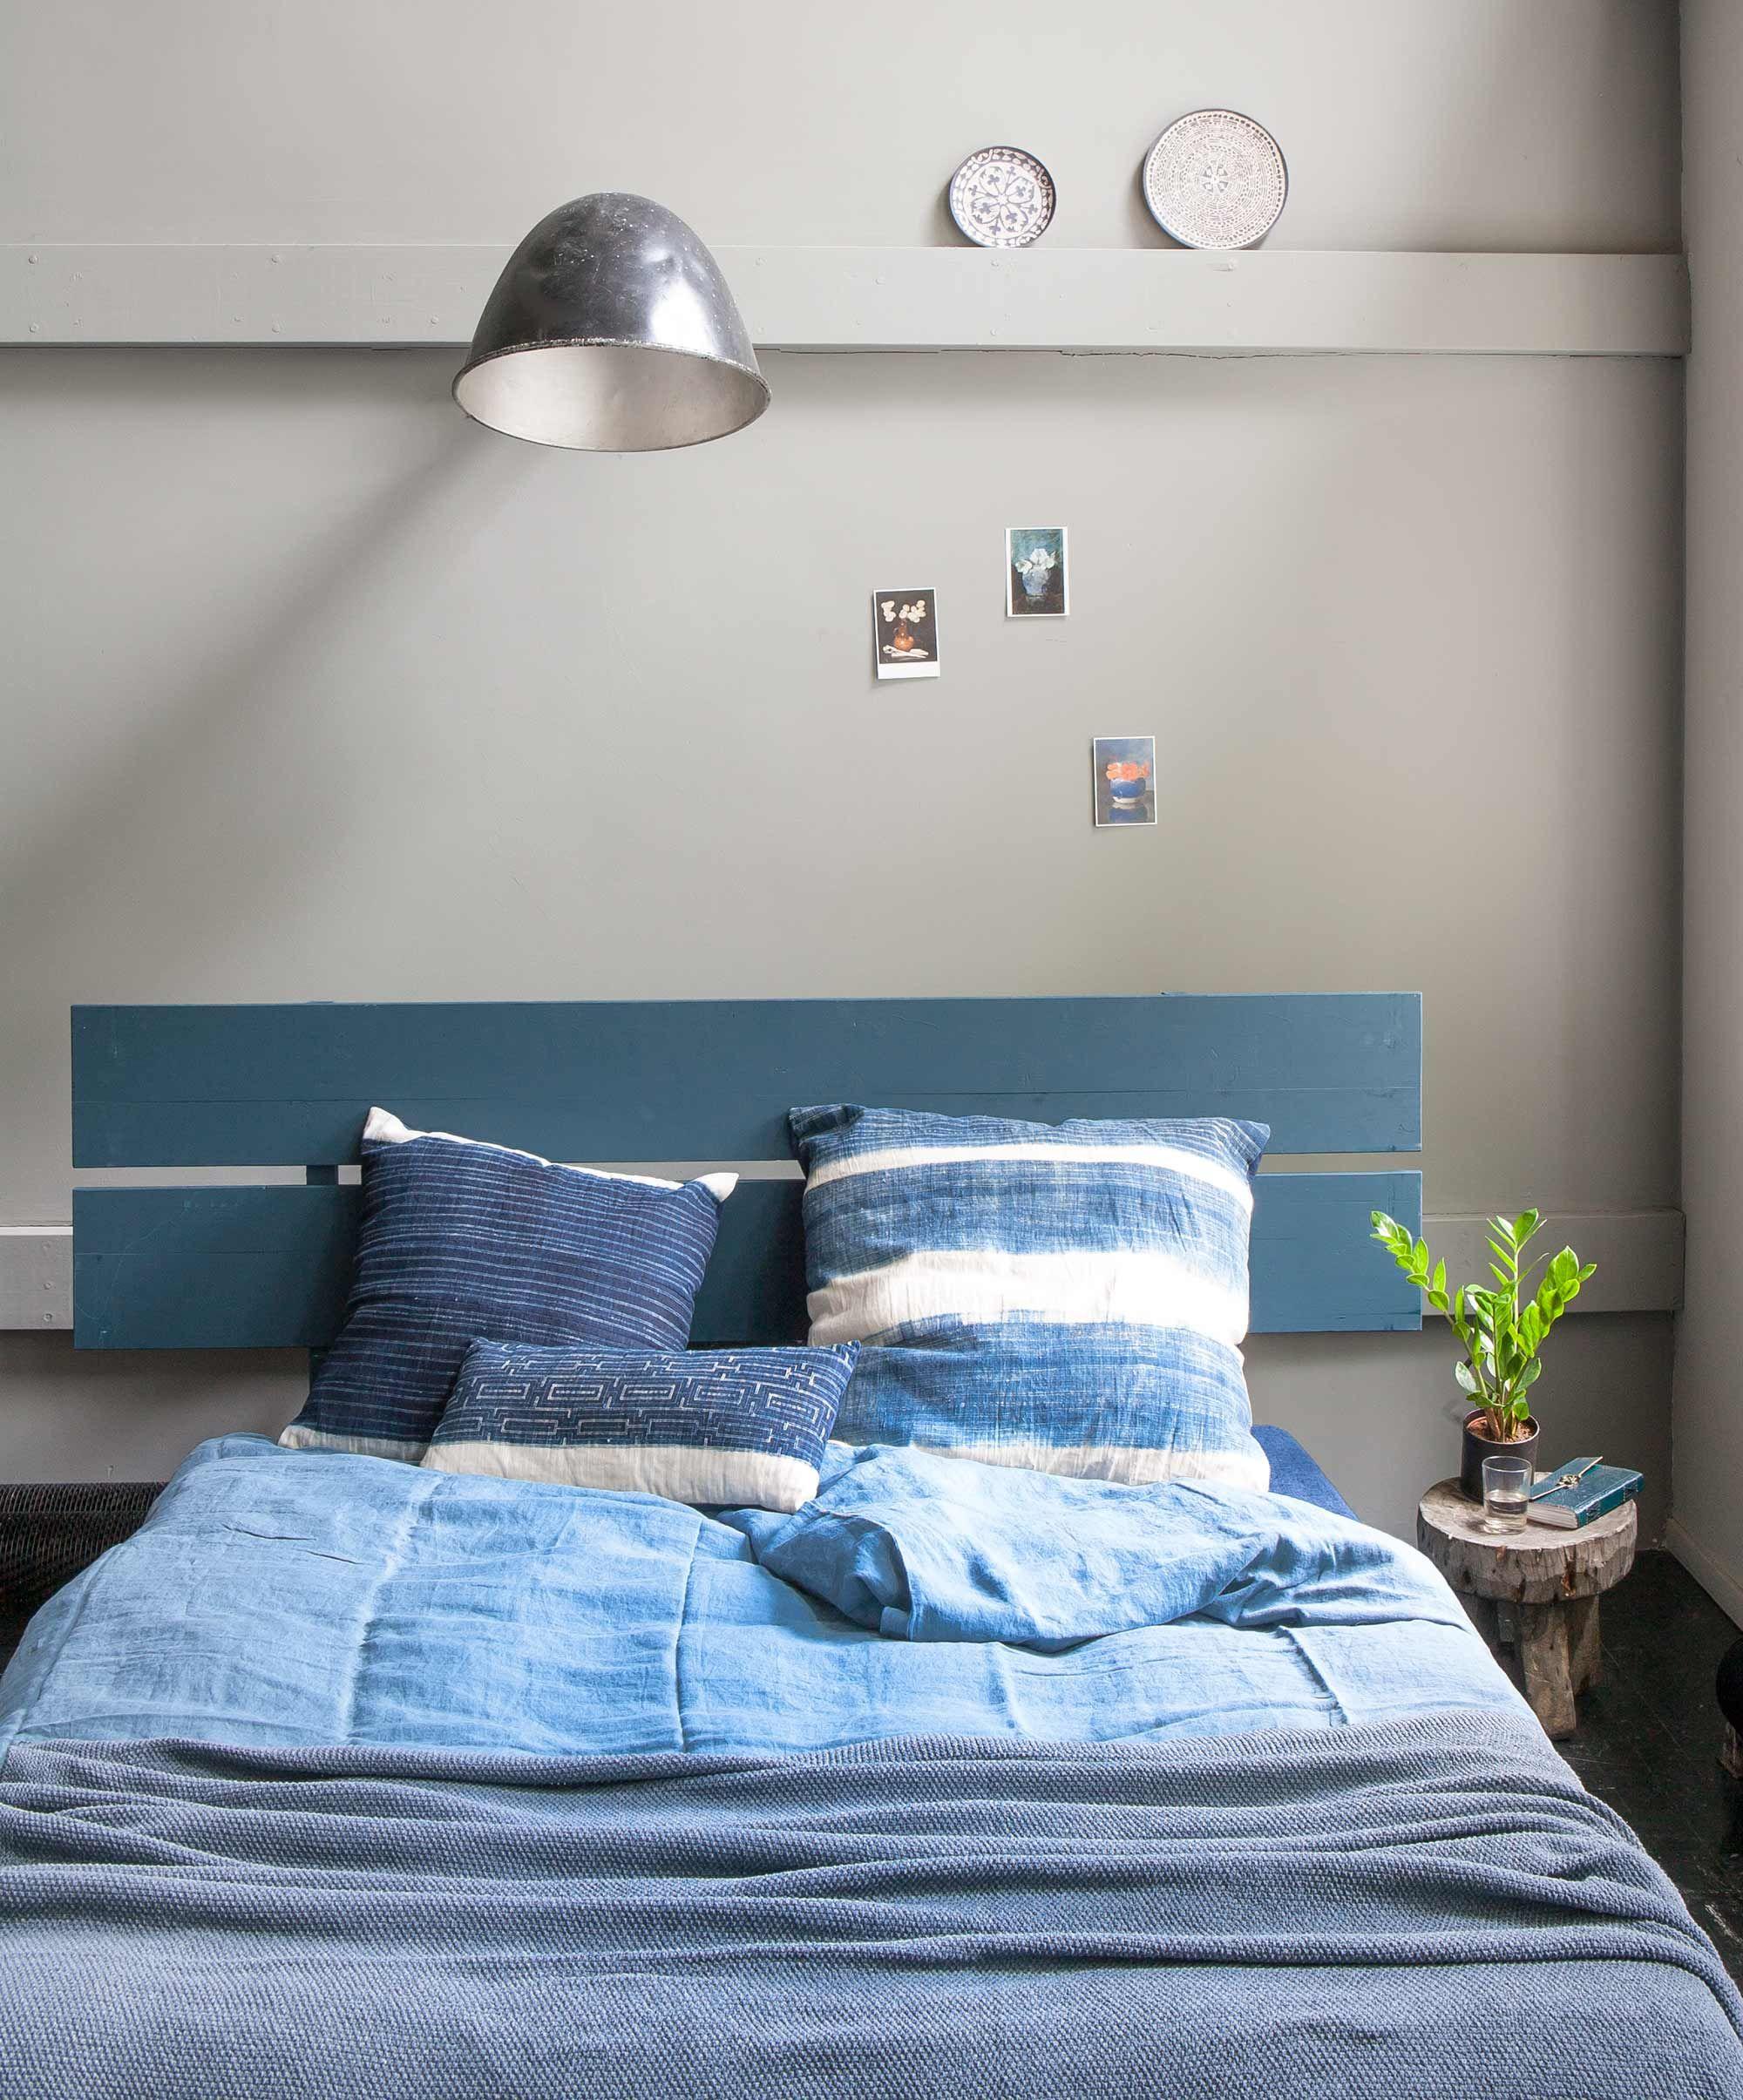 blauw slaapkamer blauw bedroom vtwonen 10 2016 photography anna de leeuw styling marianne luning